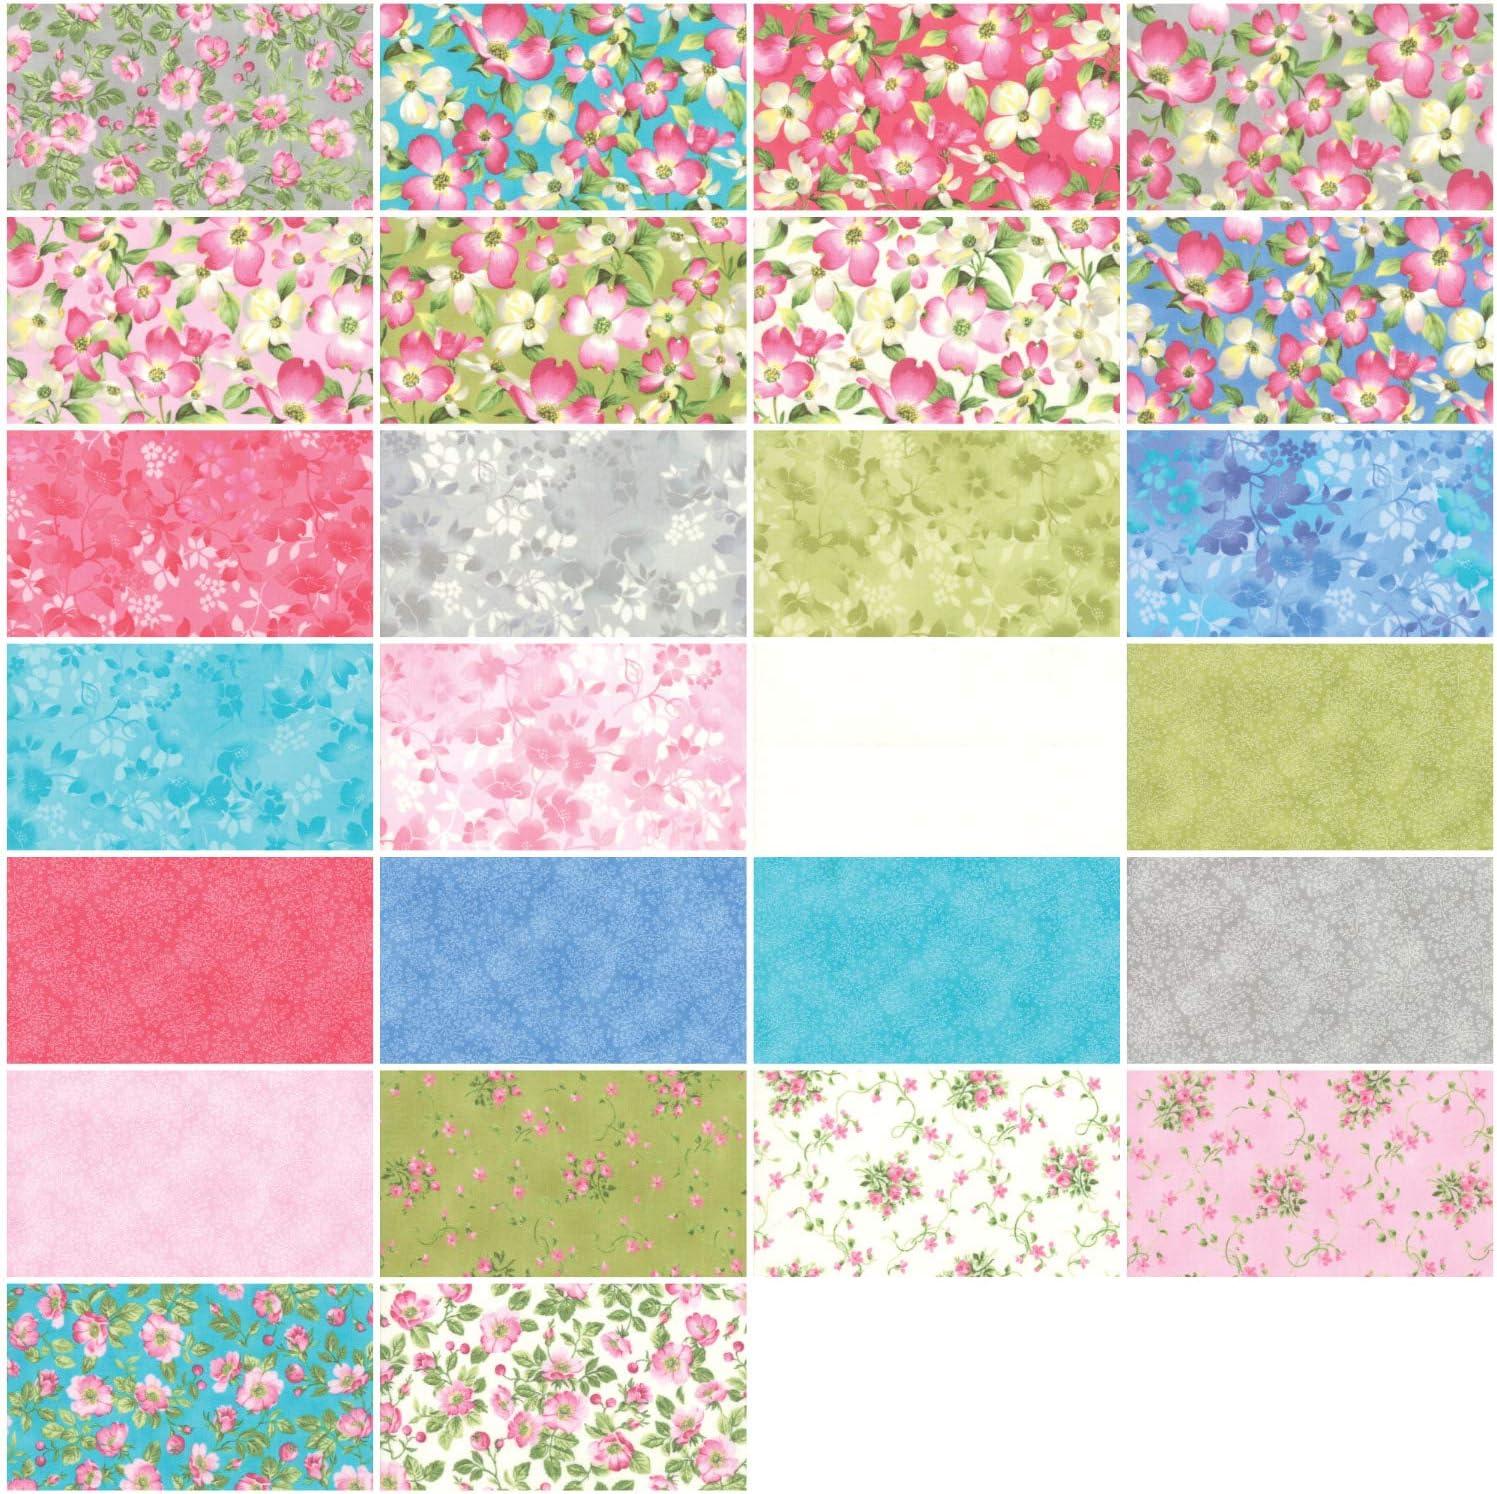 Sakura Park Charm Pack by Moda; 42-5 Inch Precut Fabric Quilt Squares